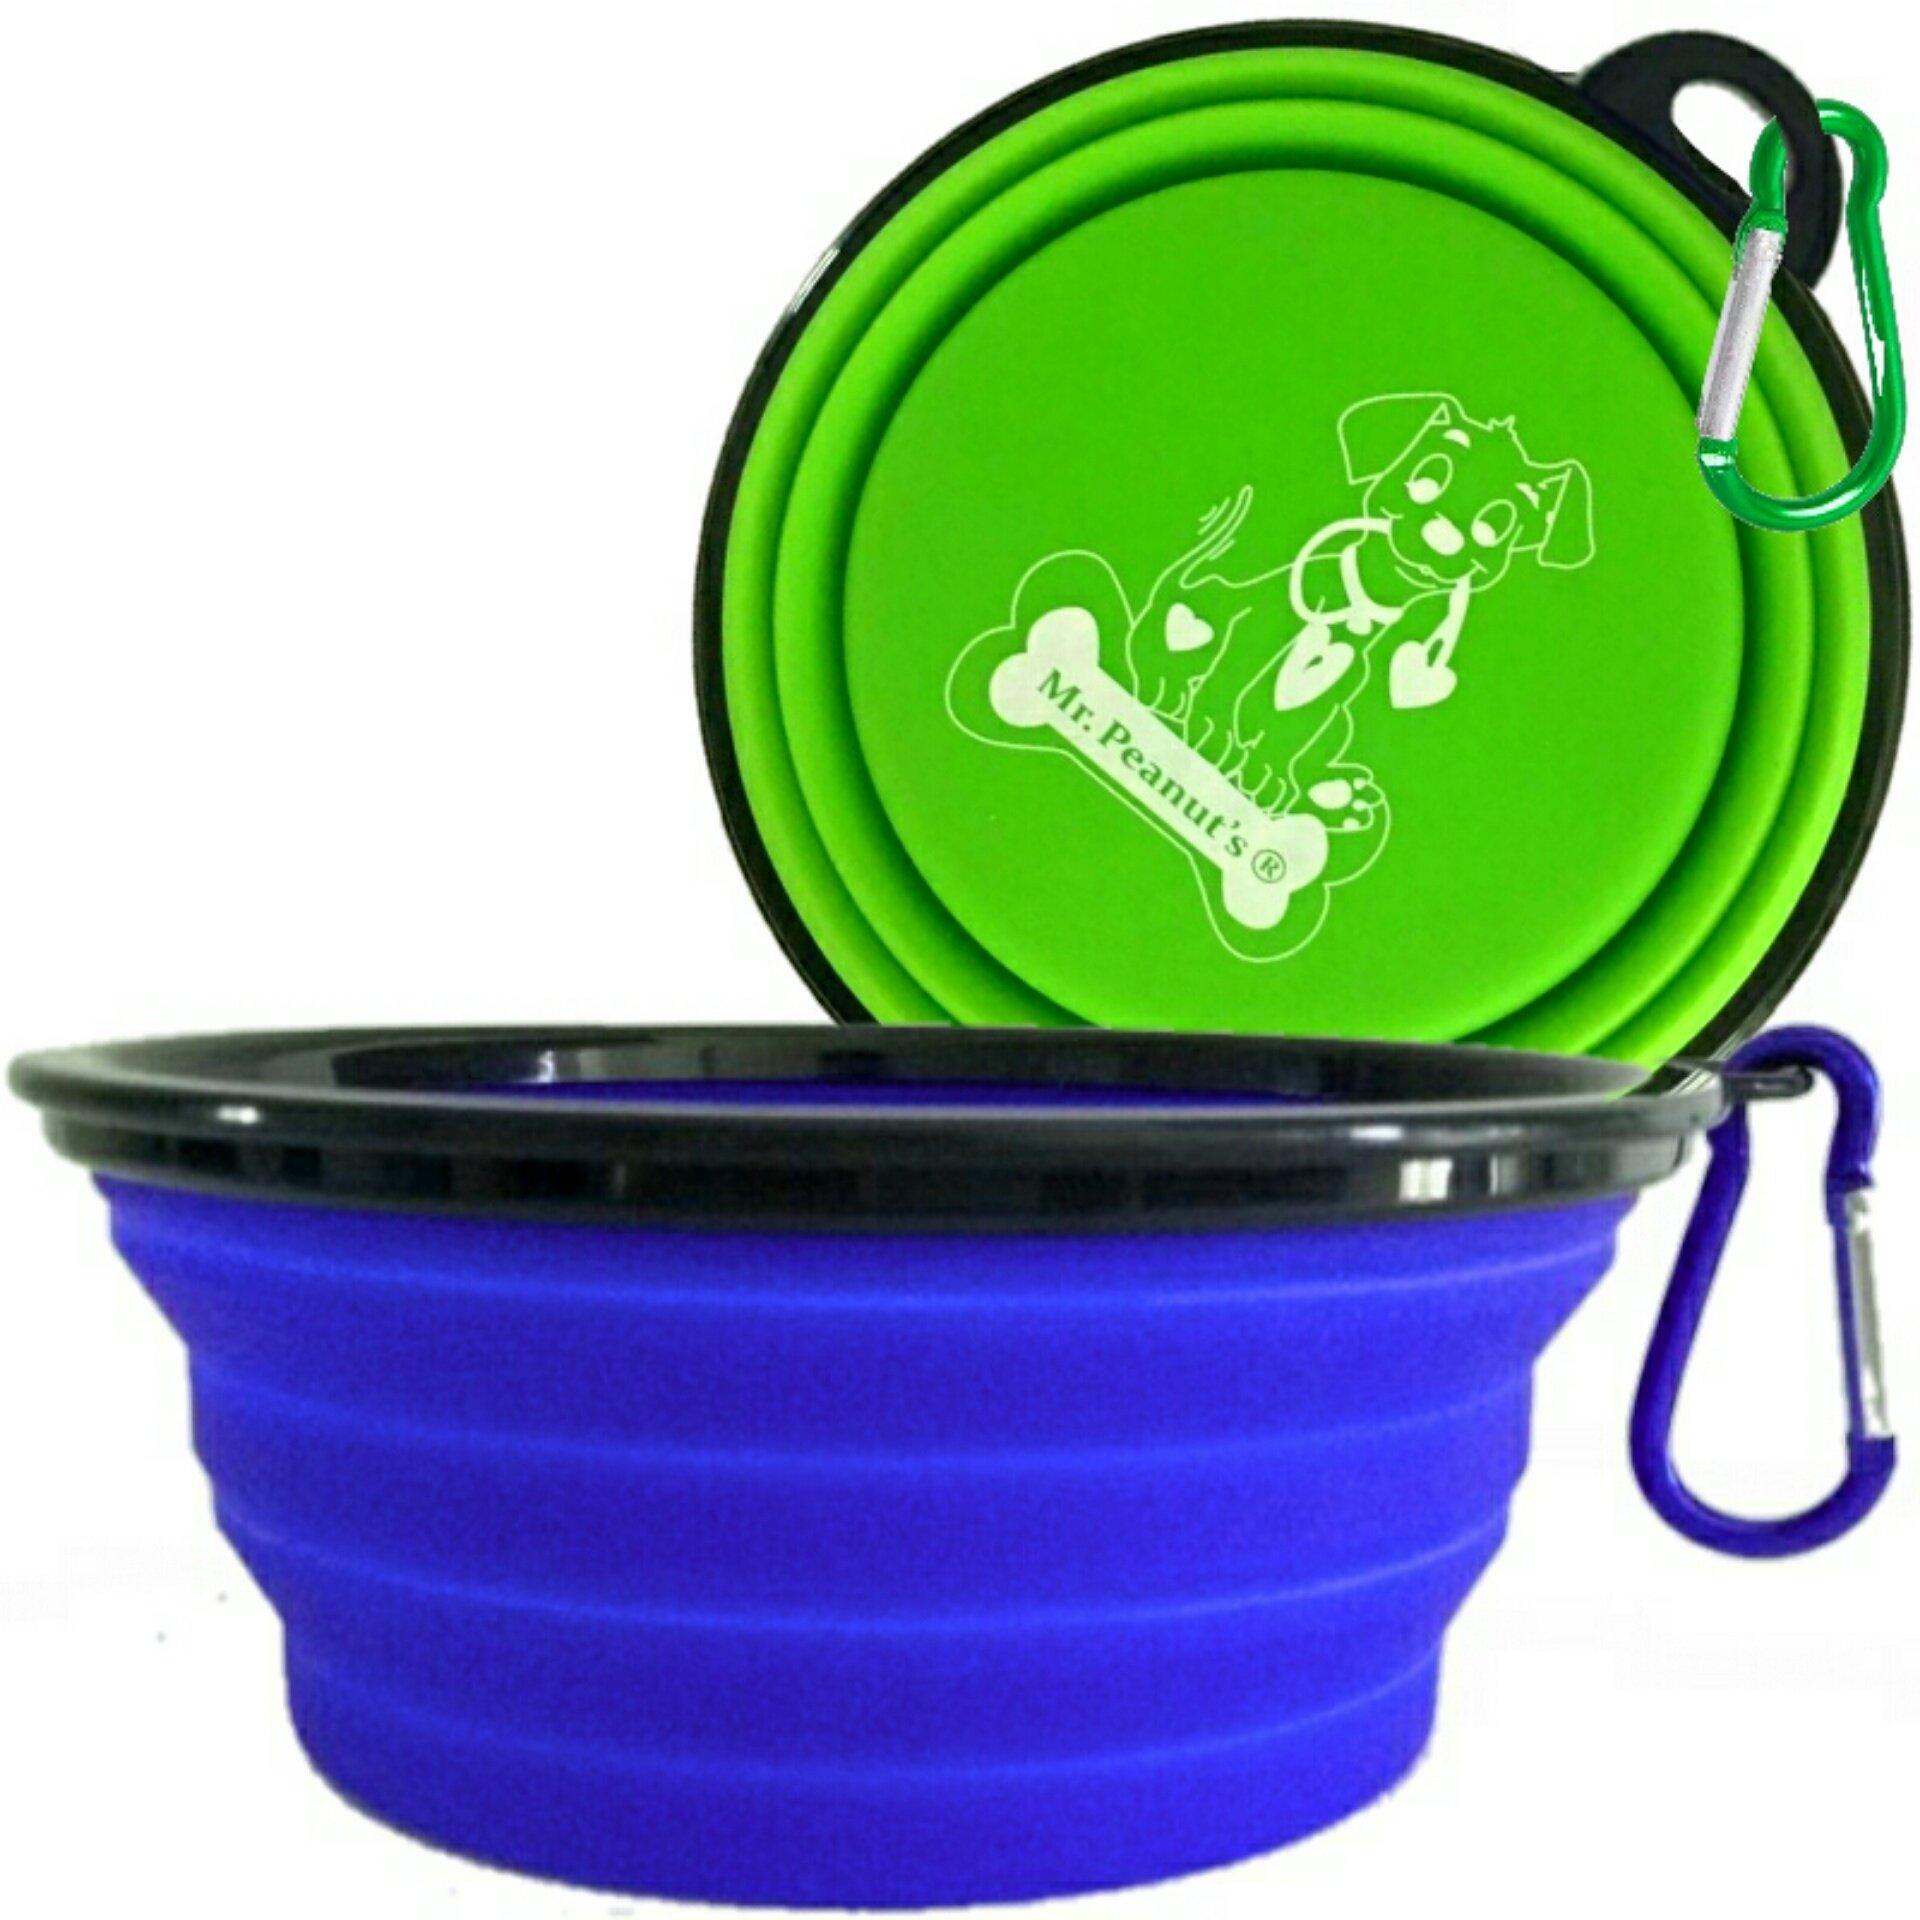 Mr. Peanut's Extra Large 34oz, 7'' Diameter, 2 Pak Collapsible Dog Bowls for Large & Med Dogs, Dishwasher Safe BPA FREE Food Grade Silicone, Portable Foldable Travel Bowls for Journeys & Hikes (2 Pak)